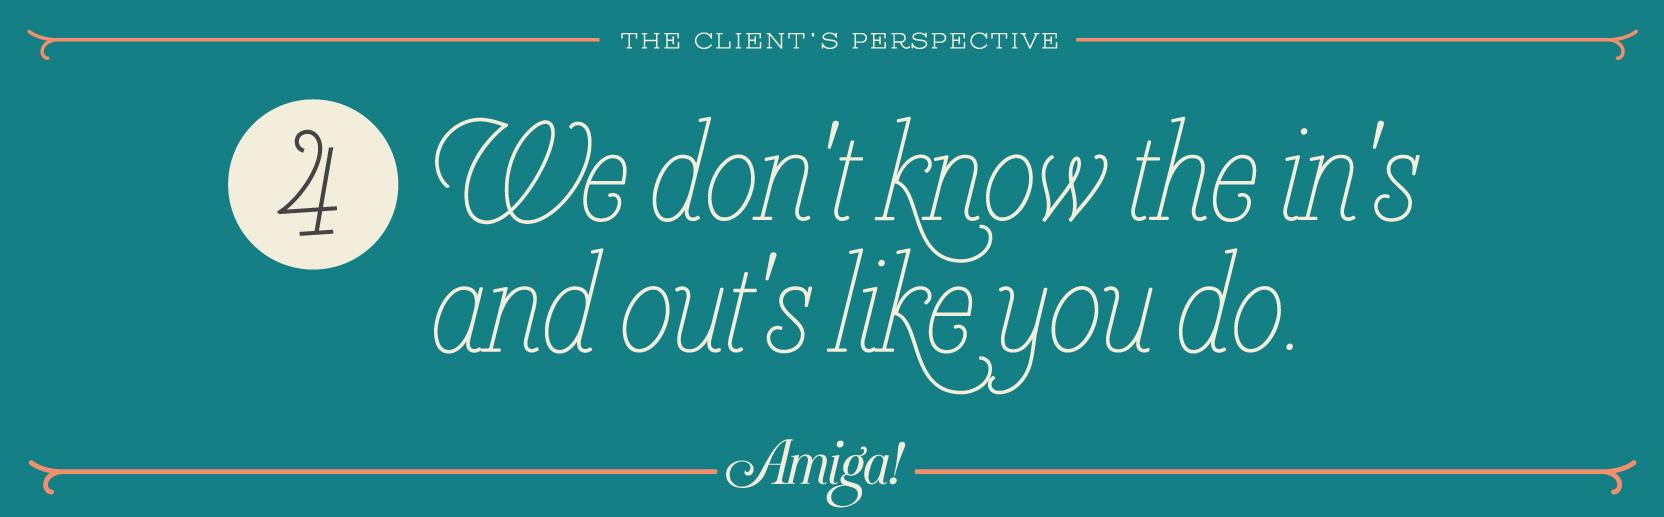 Amiga_clientPerspective_working4.jpg